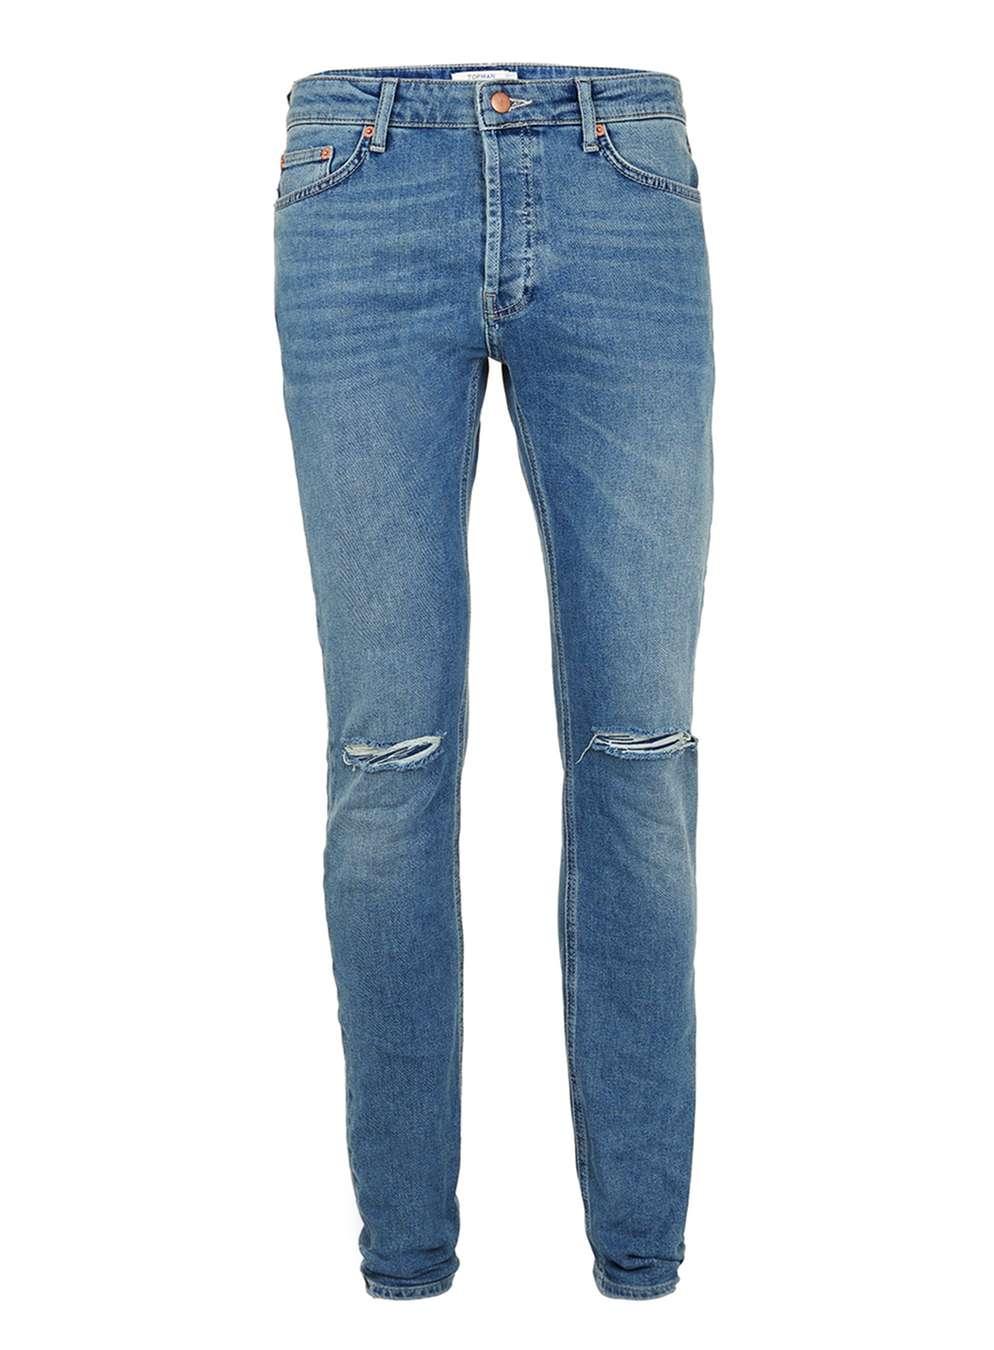 Light wash Rip Jeans